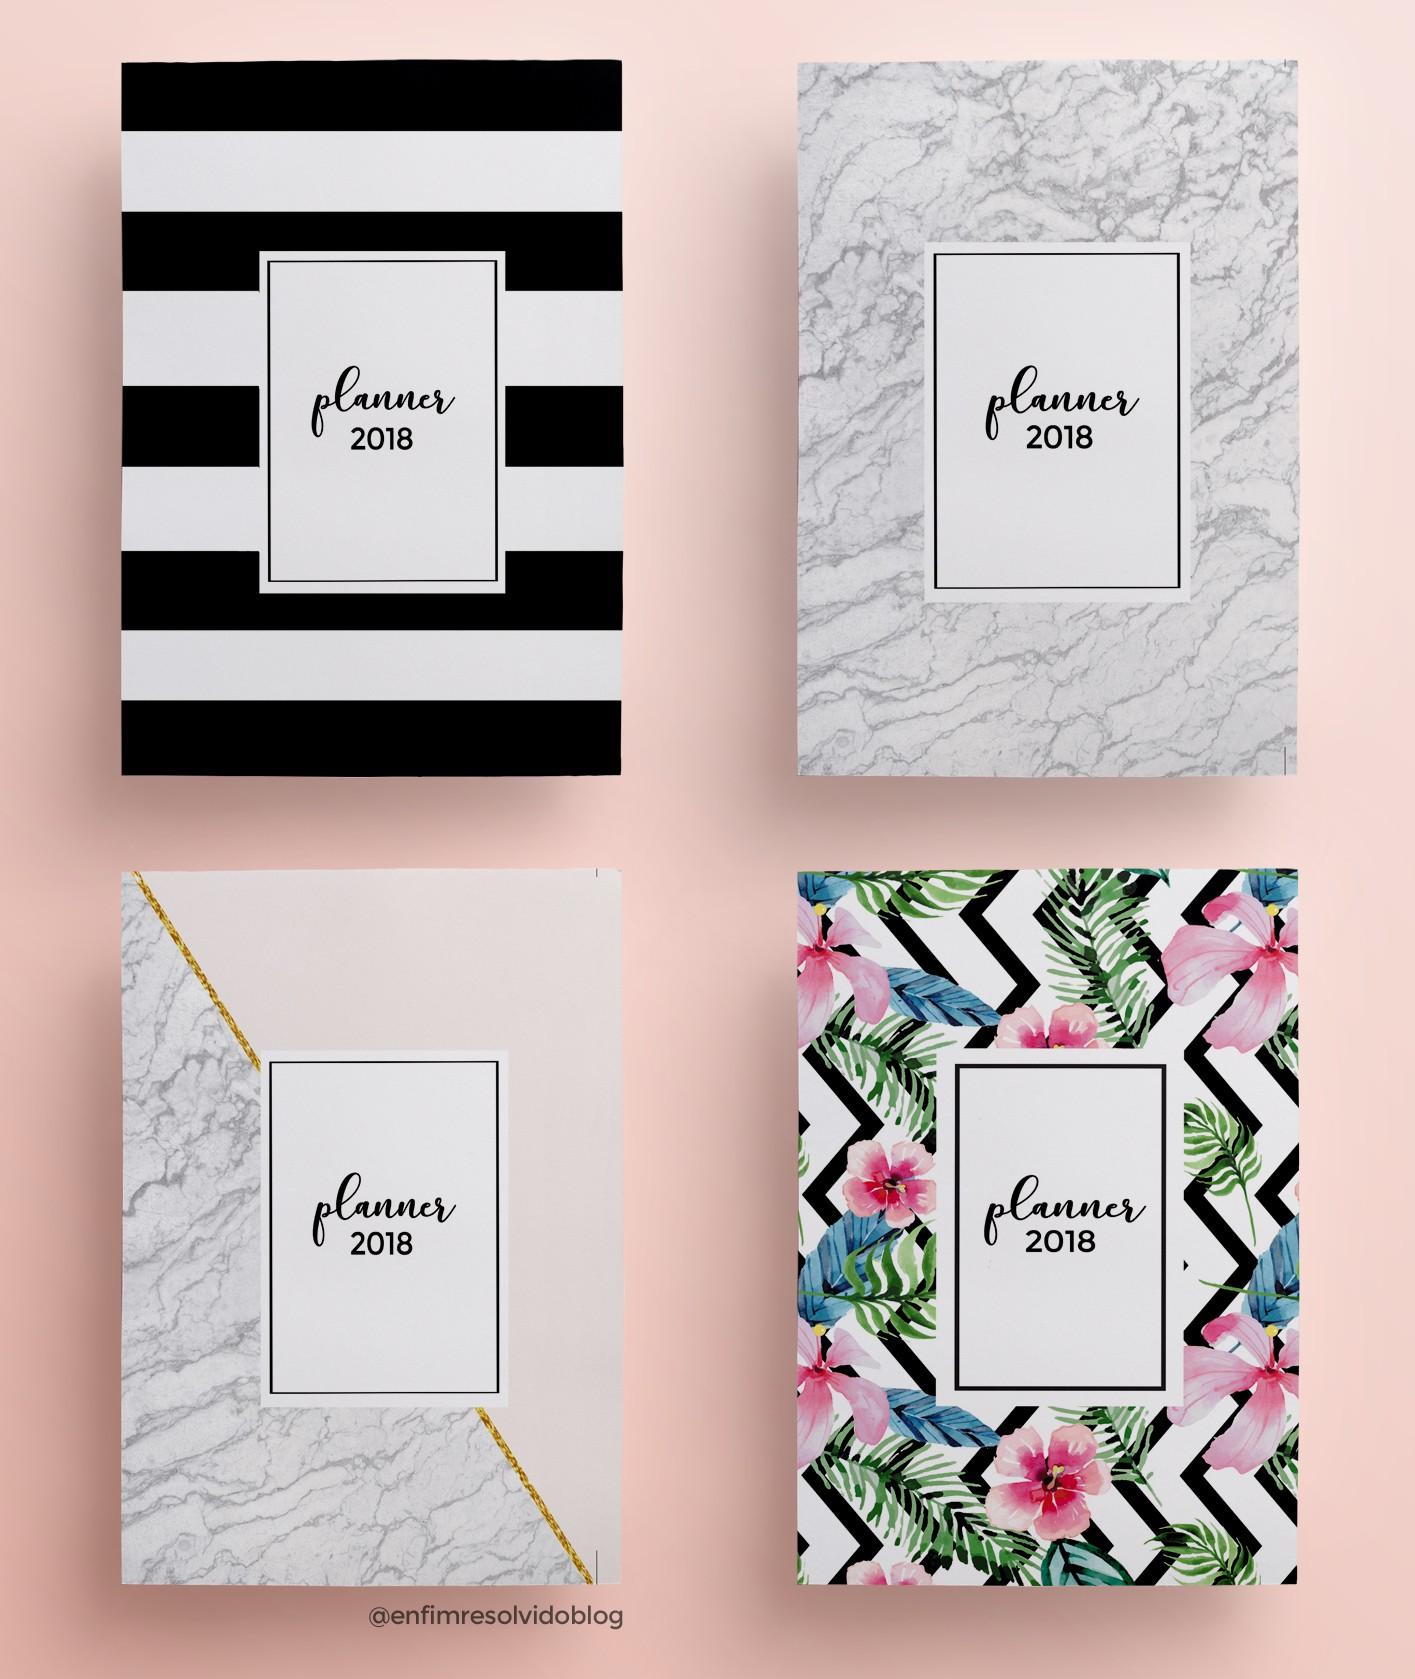 Download do planner 2018 vers£o P&B minimalista